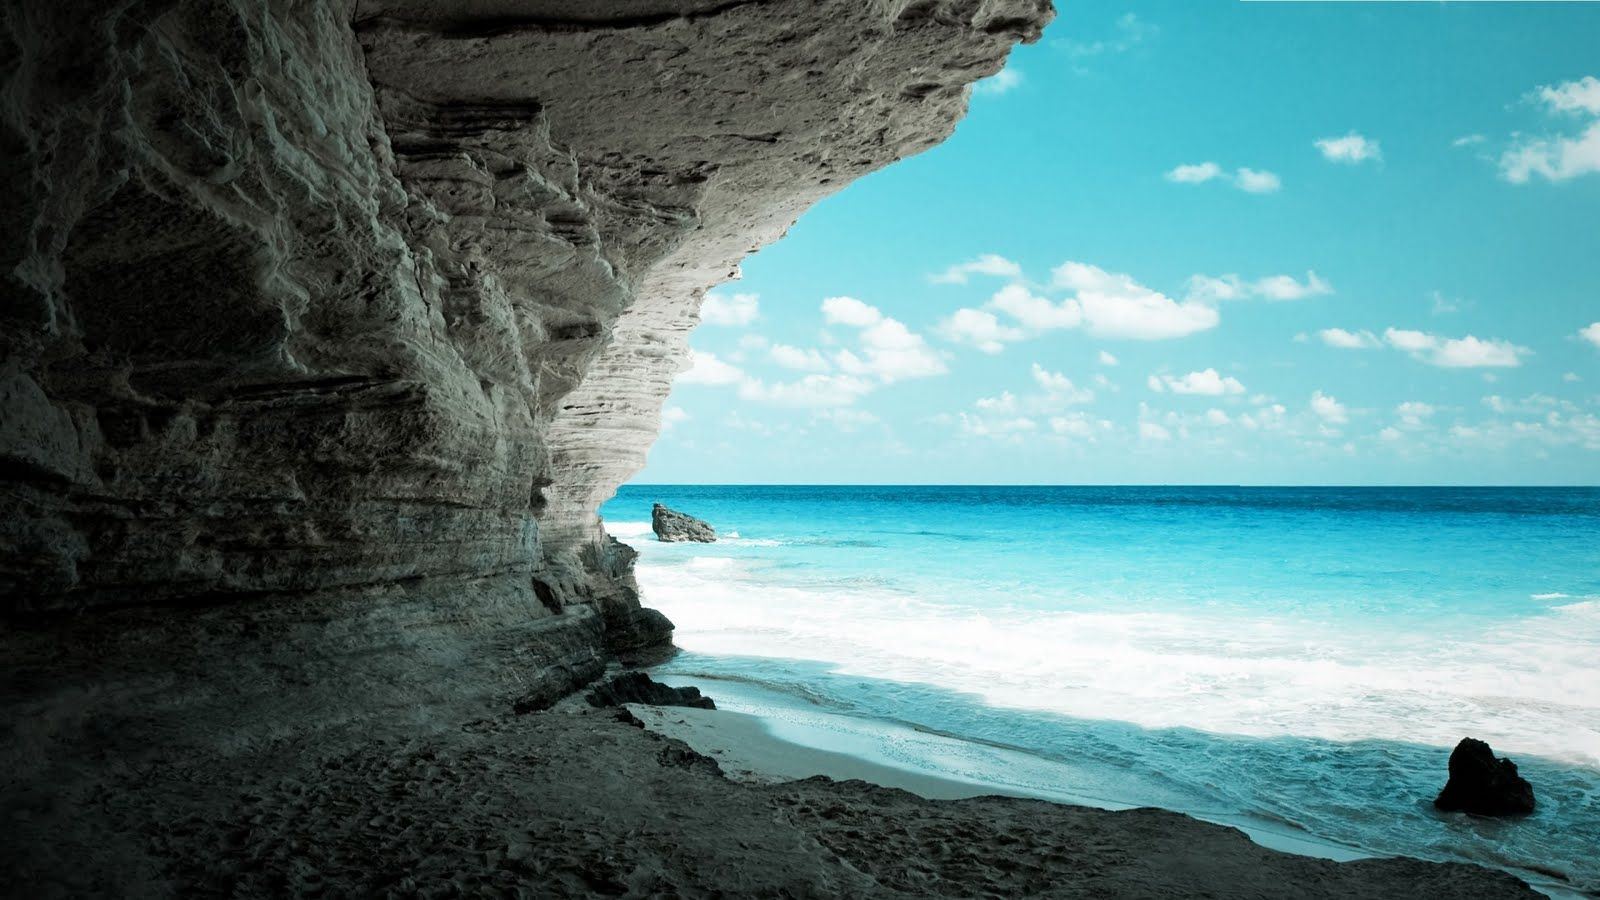 Fondos De Pantallas Windows 7 Hd Paisajes Papel Mural De Playa Ideas De Fotos De Playa Fotografia Paisaje